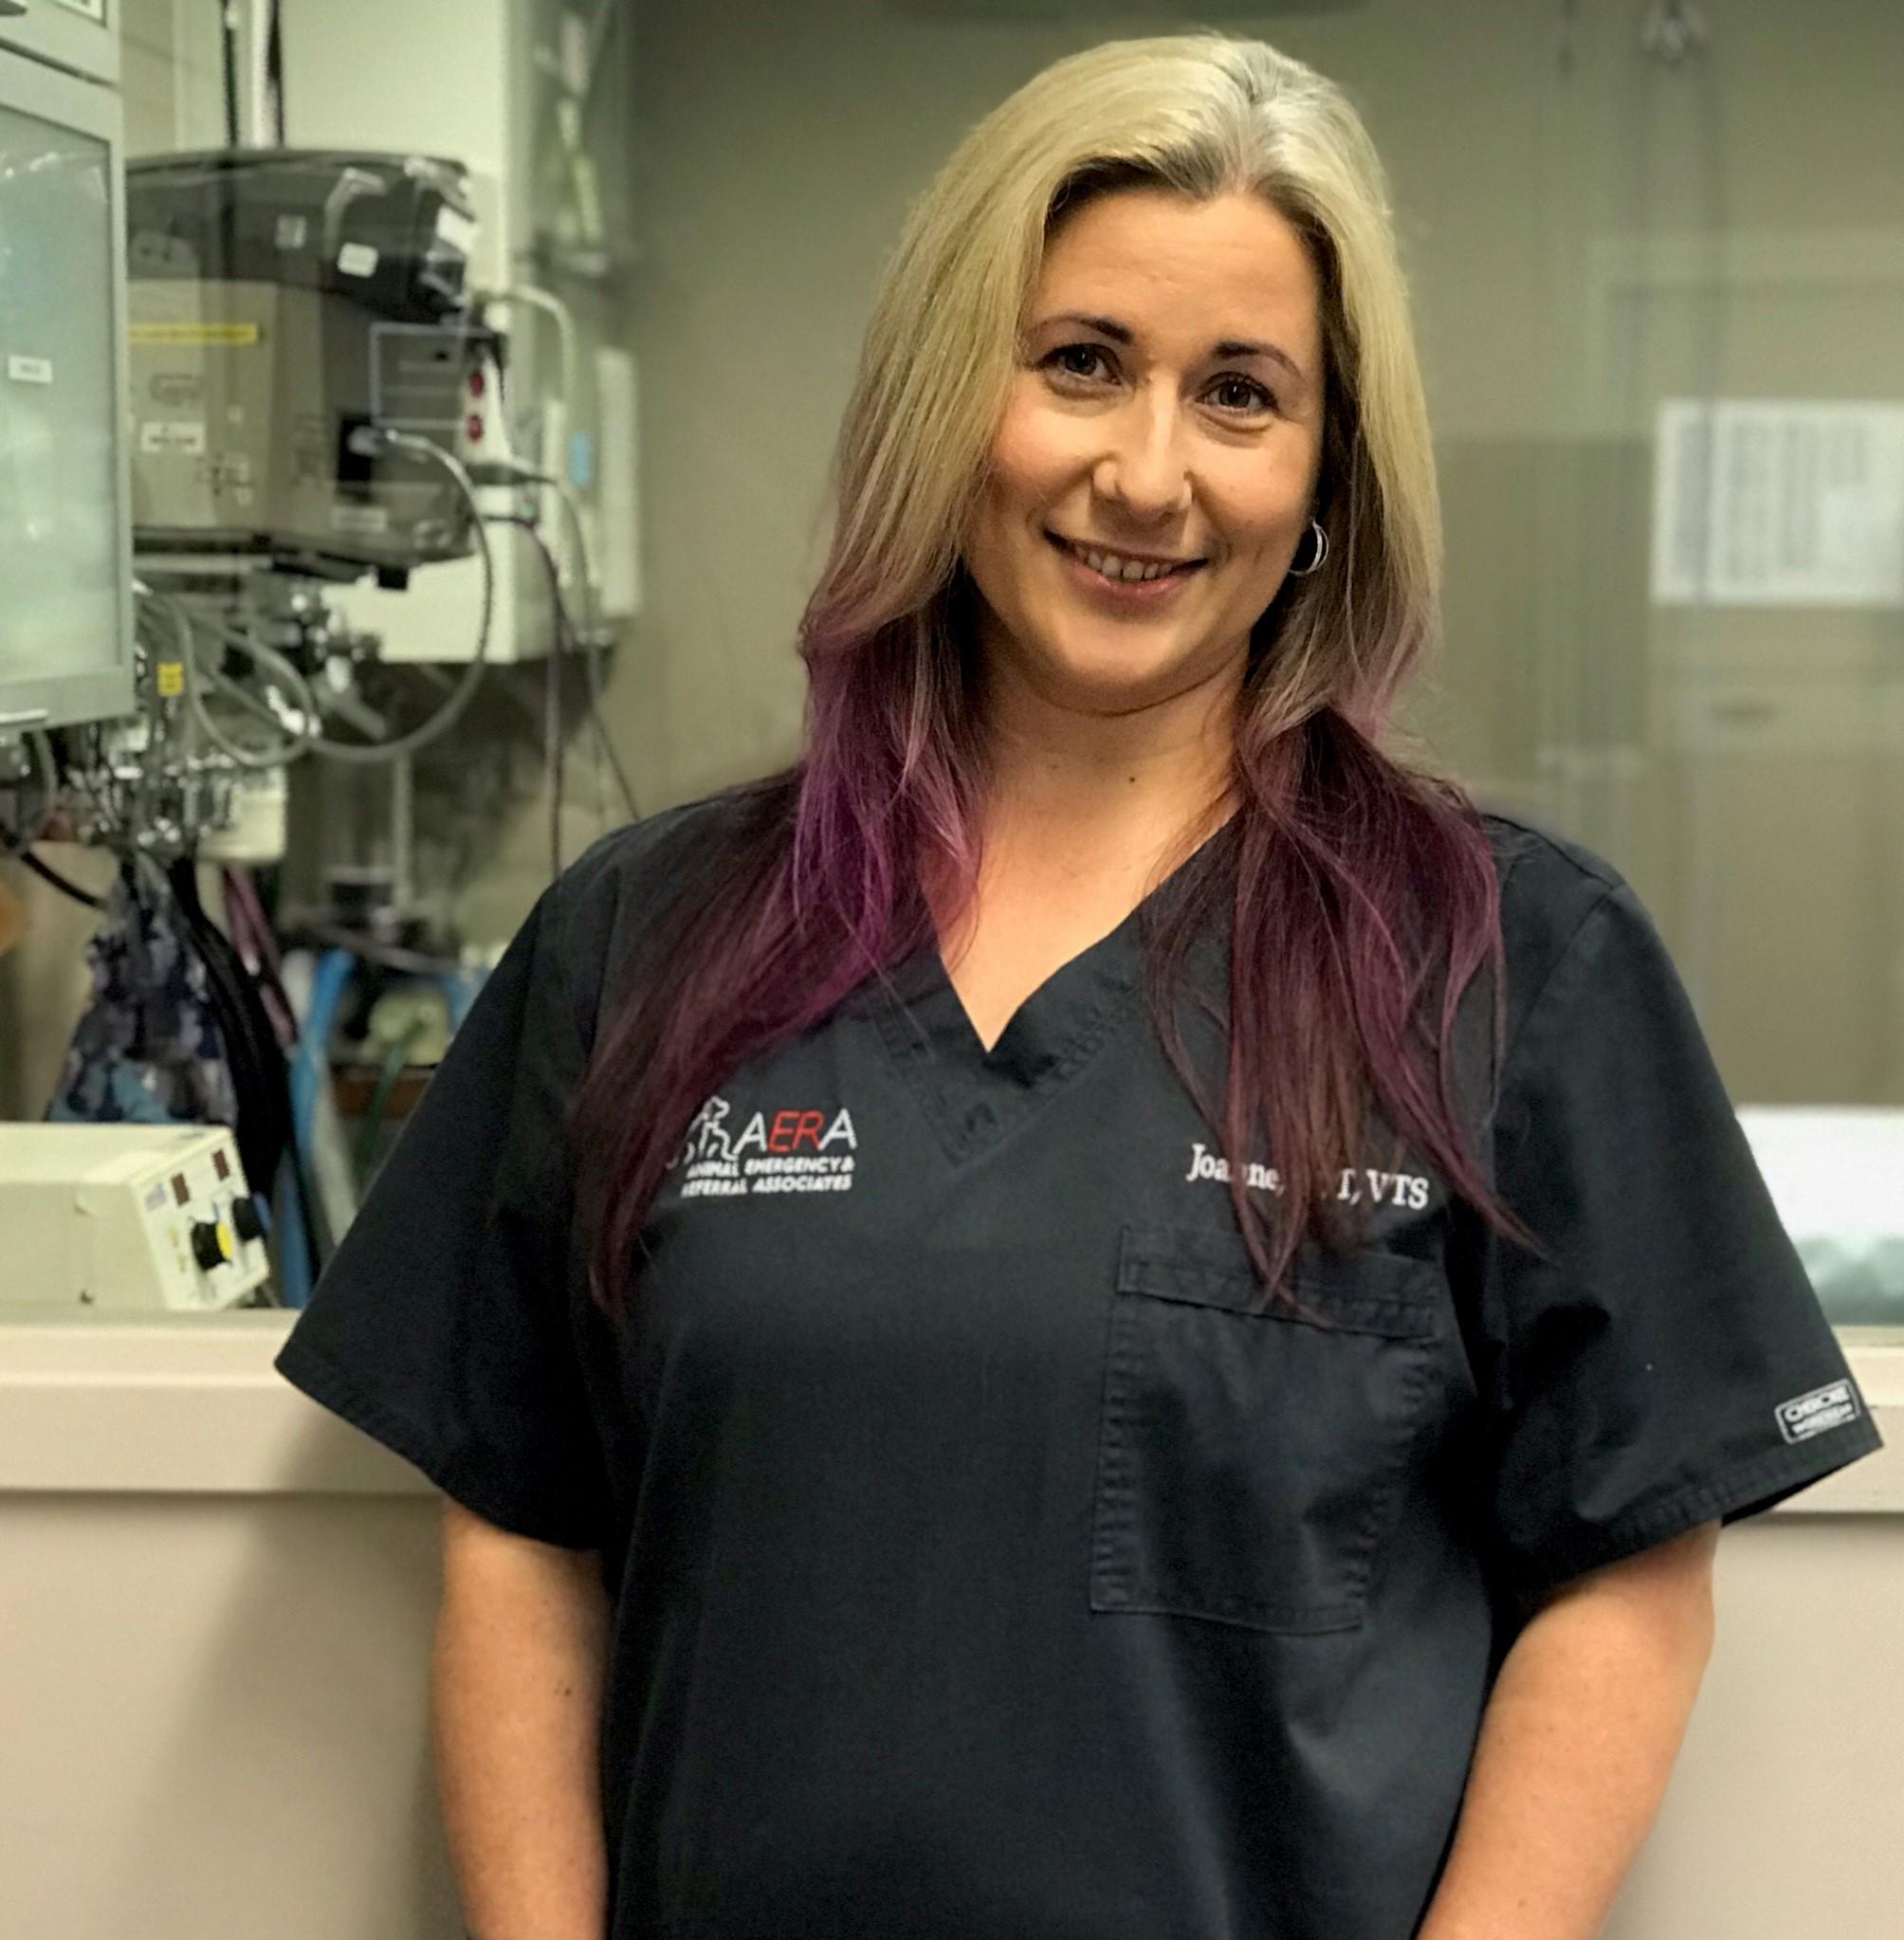 Joanne-Zimmerman-CVT-VTS-1 Team